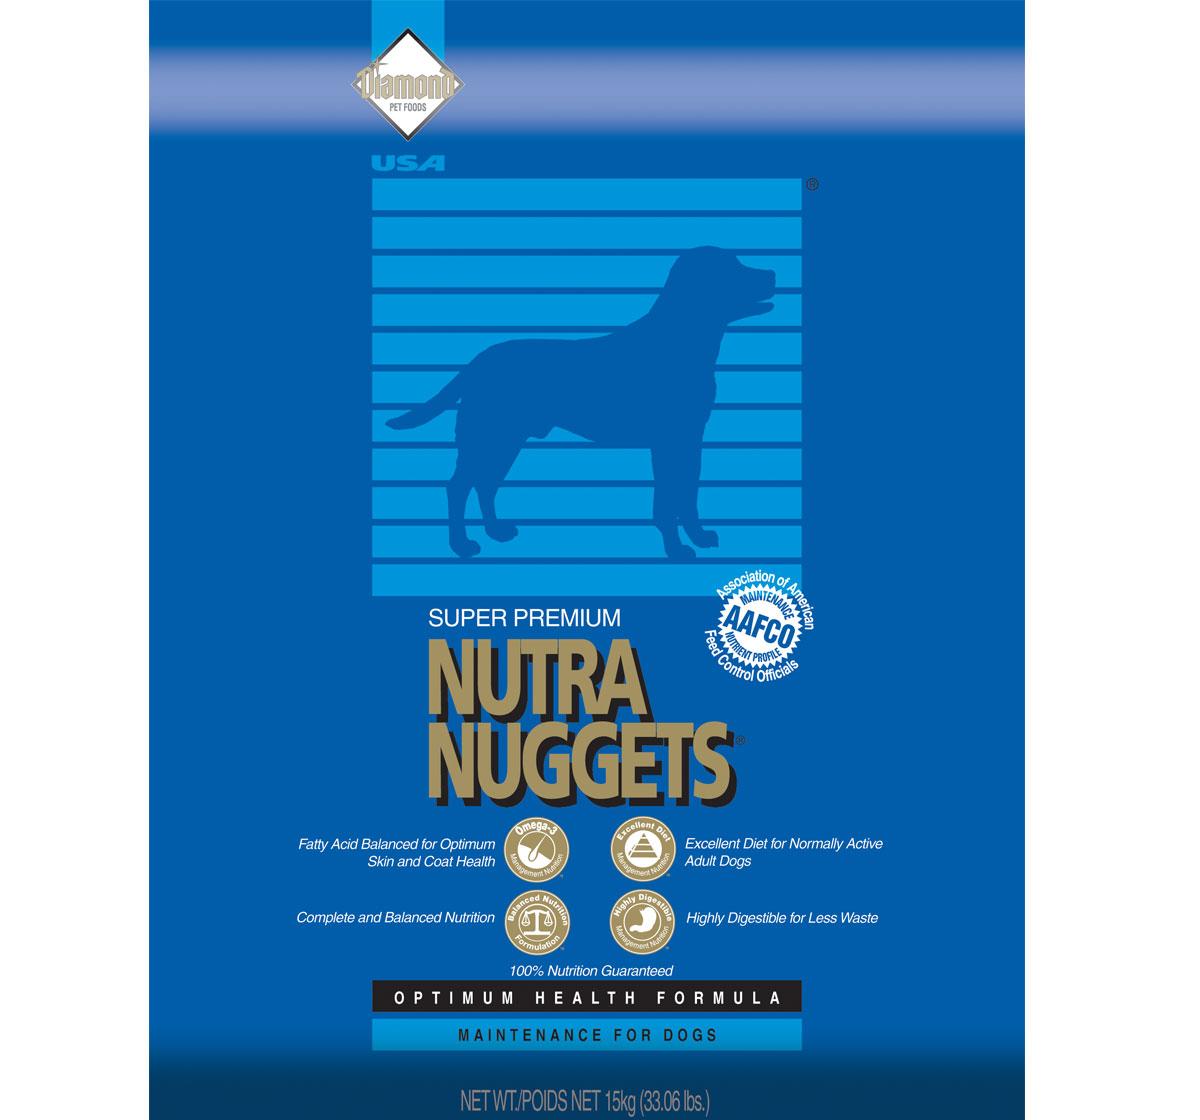 Diamond Naturals Grain Free Dog Food Recall